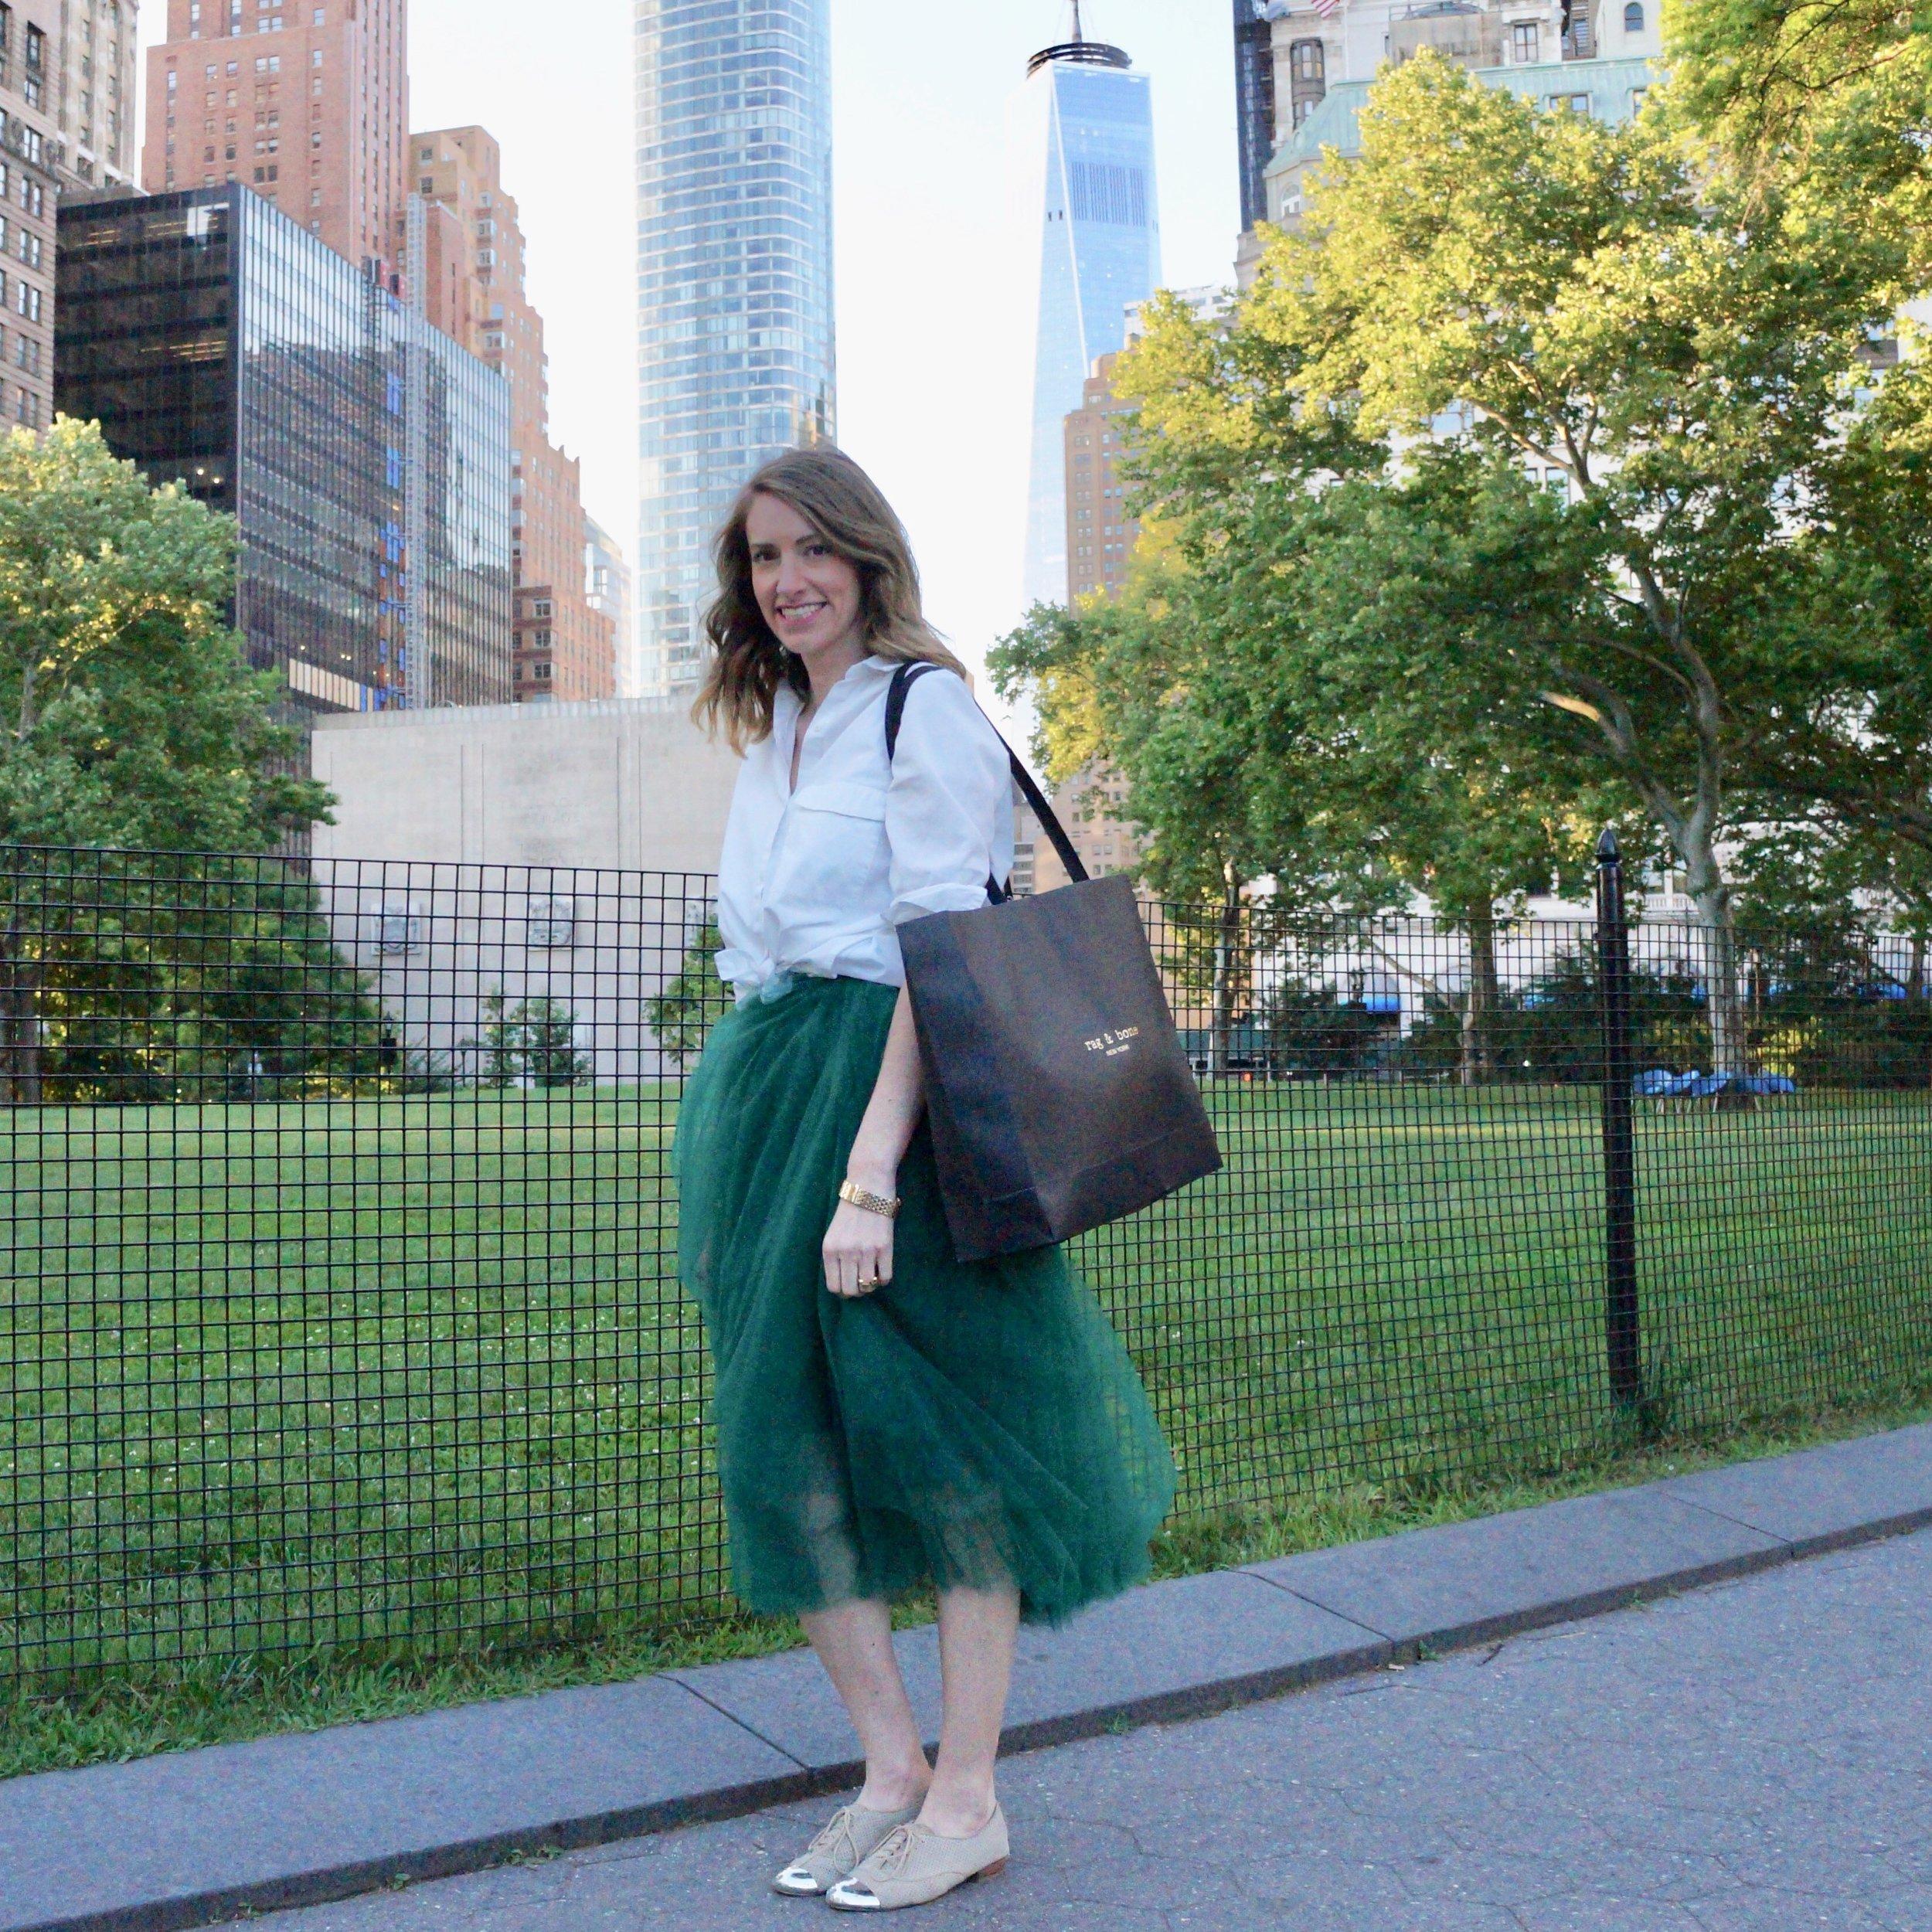 hero-style-advice-wardrobe-image-consultant-nyc.JPG